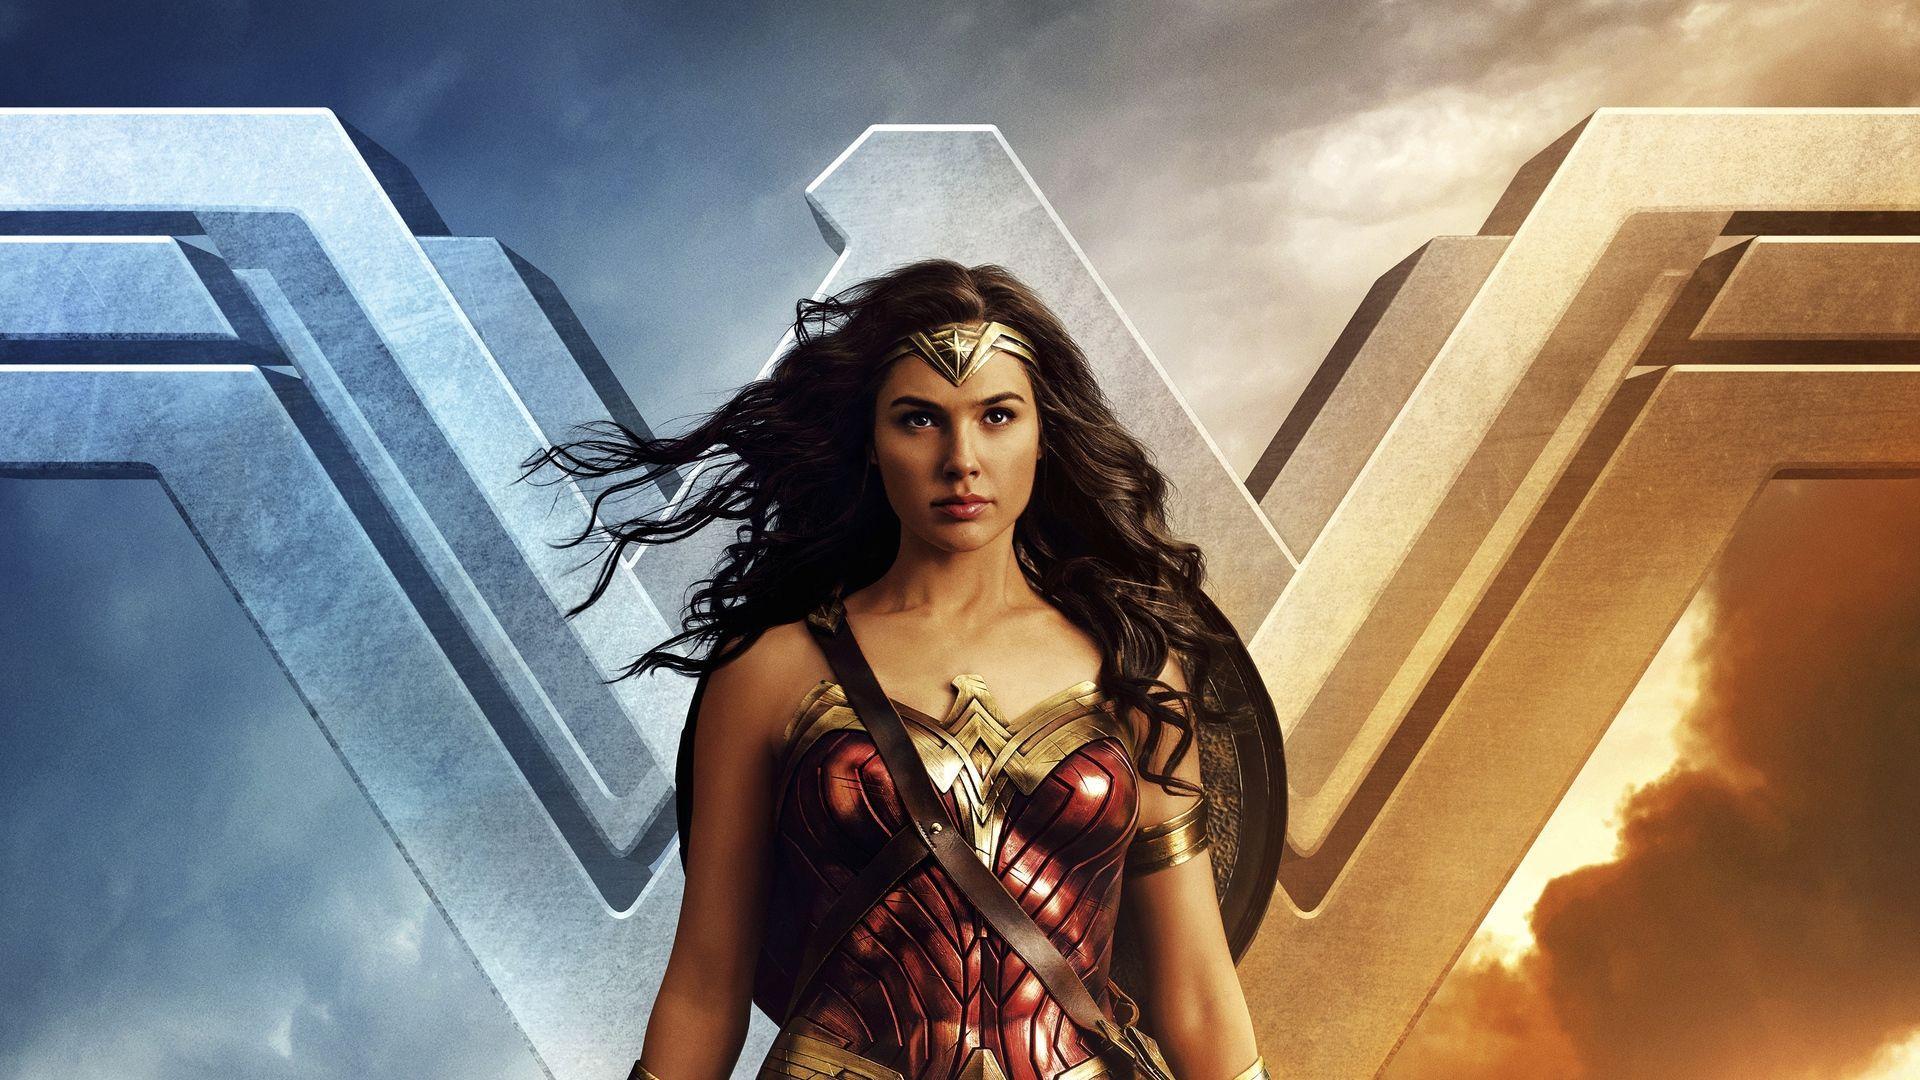 2017 Wonder Woman Wallpapers: Wonder Woman 2017 Wallpapers